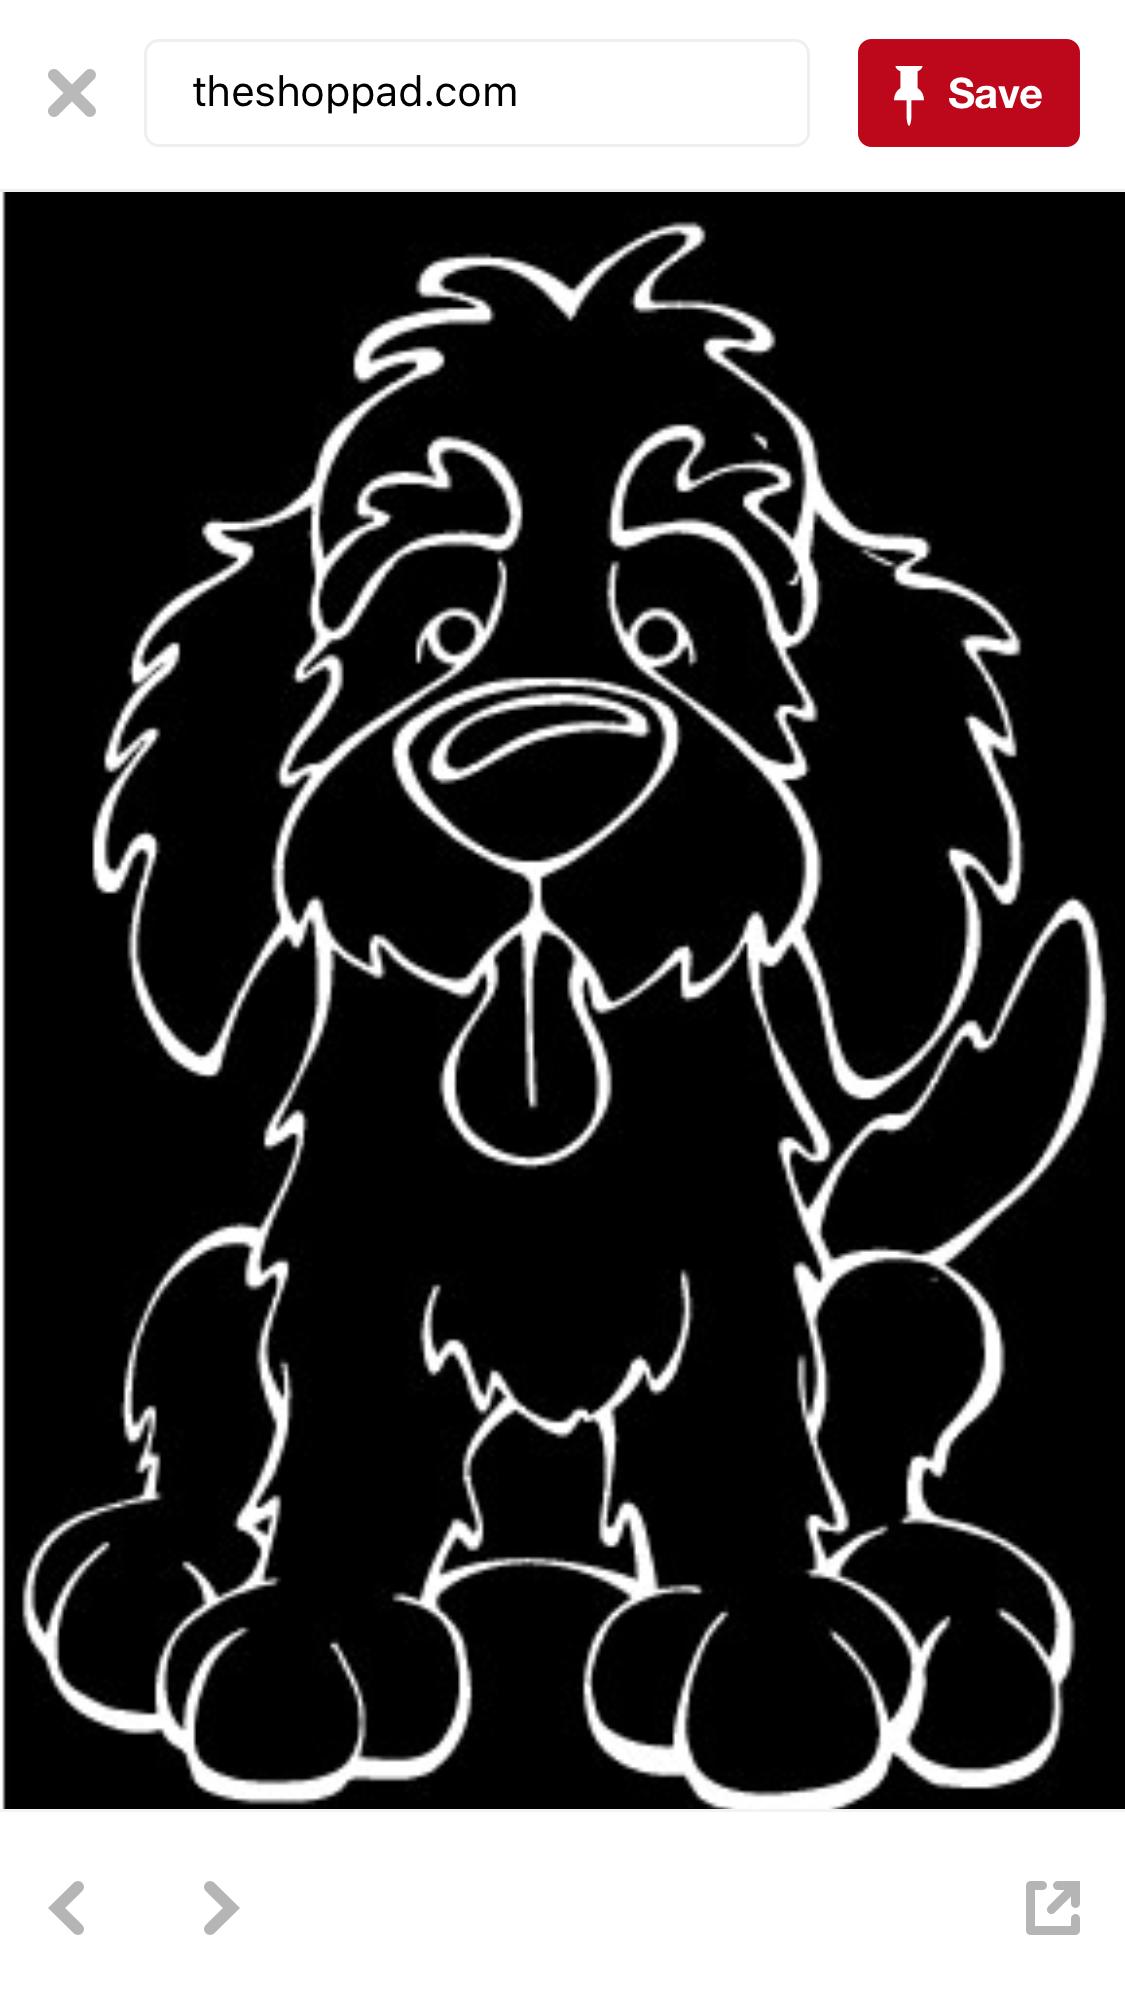 Pin By Teri Vandeven On Cricut Fonts Images Svg Png Vector Dog Decals Labradoodle Art Labradoodle [ 2001 x 1125 Pixel ]